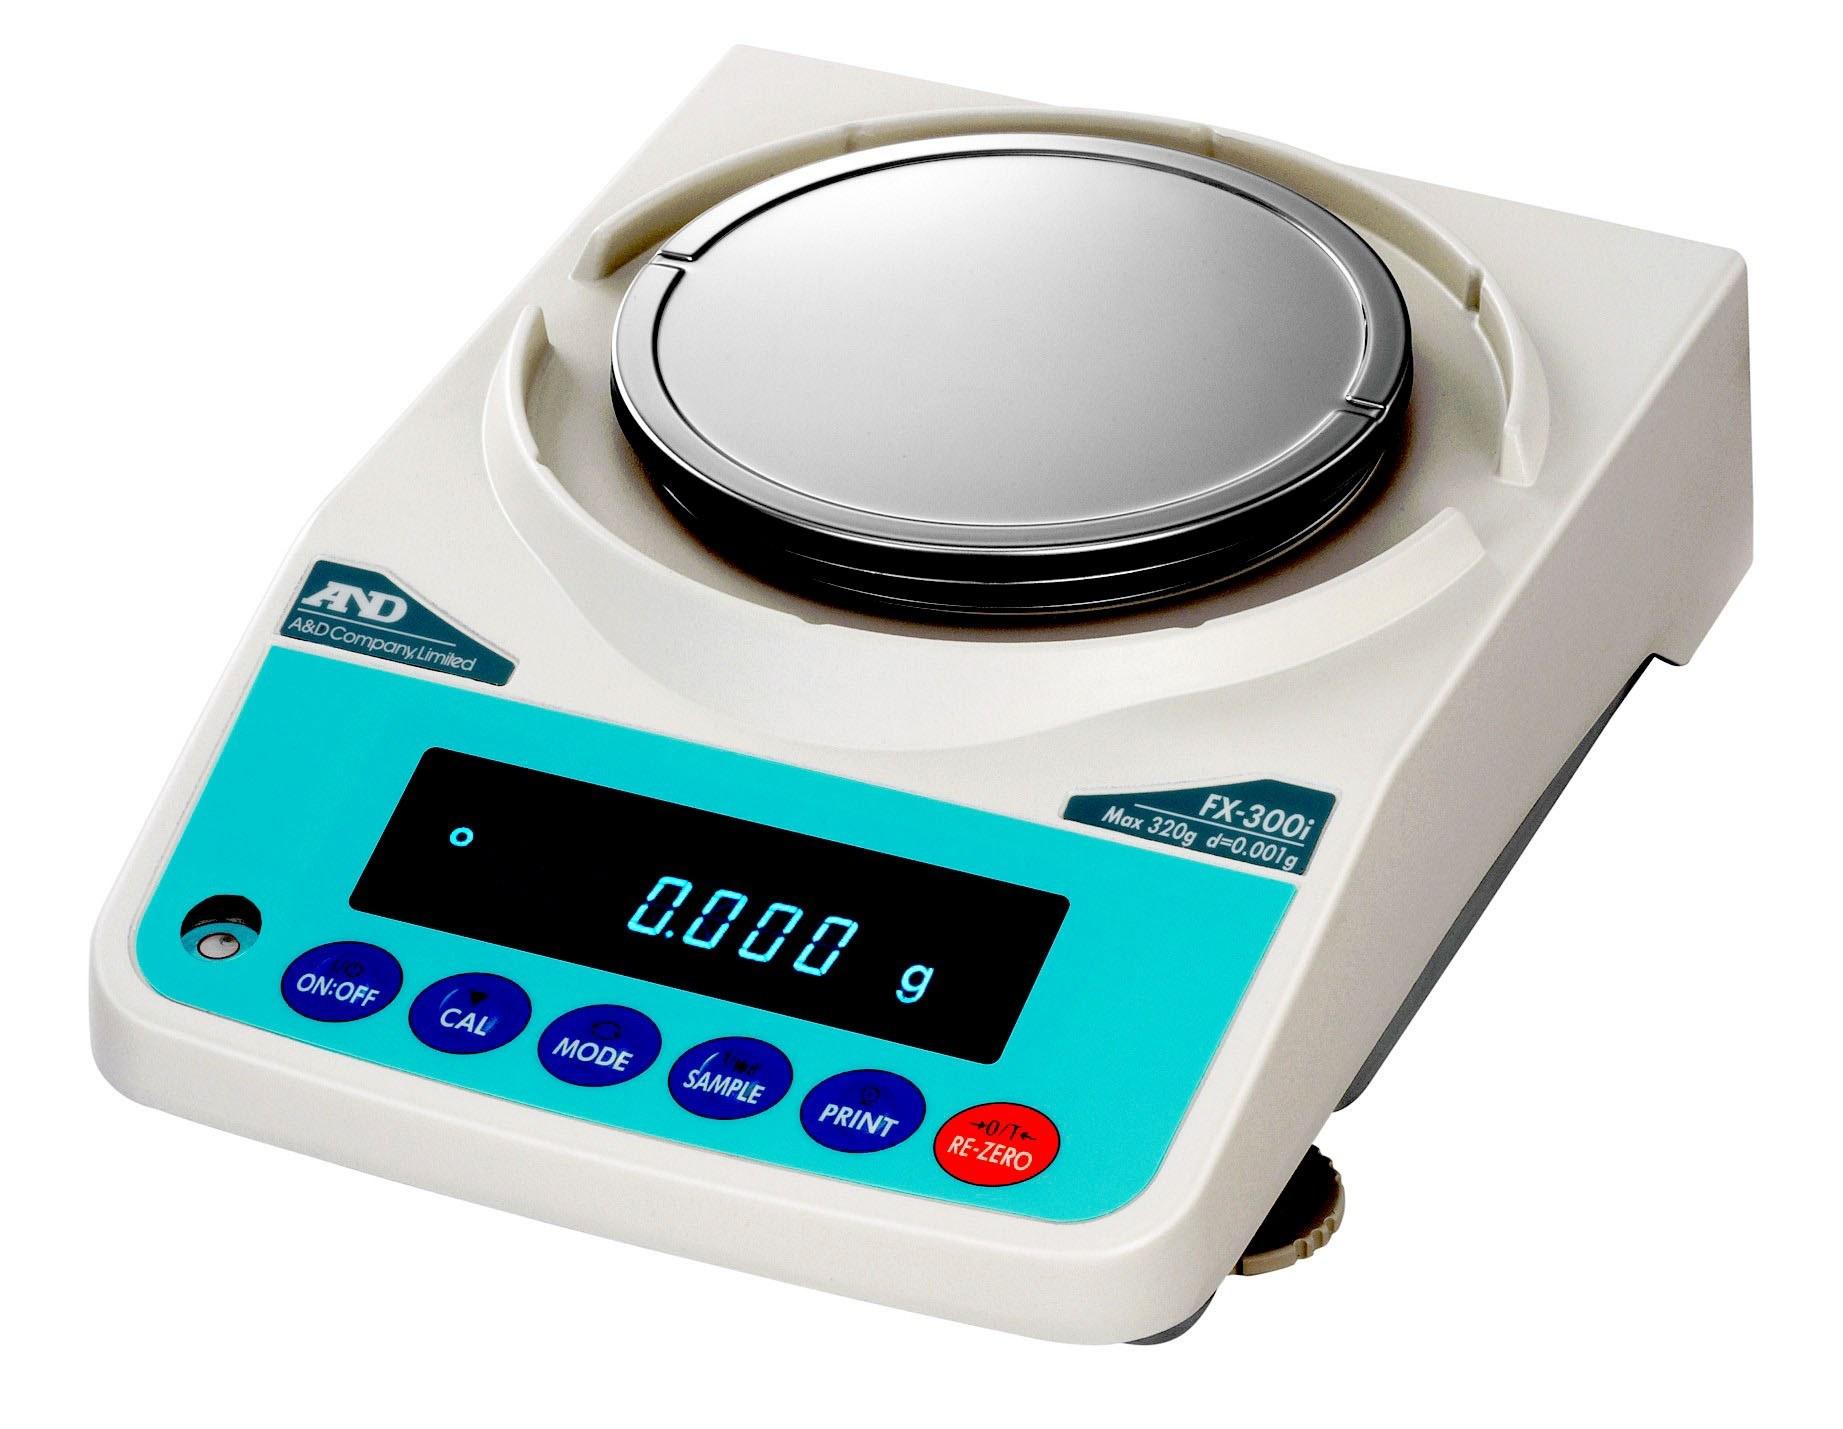 main images ترازوی آزمایشگاهی AND مدل FX300I Laboratory Scale Model FX 300 I